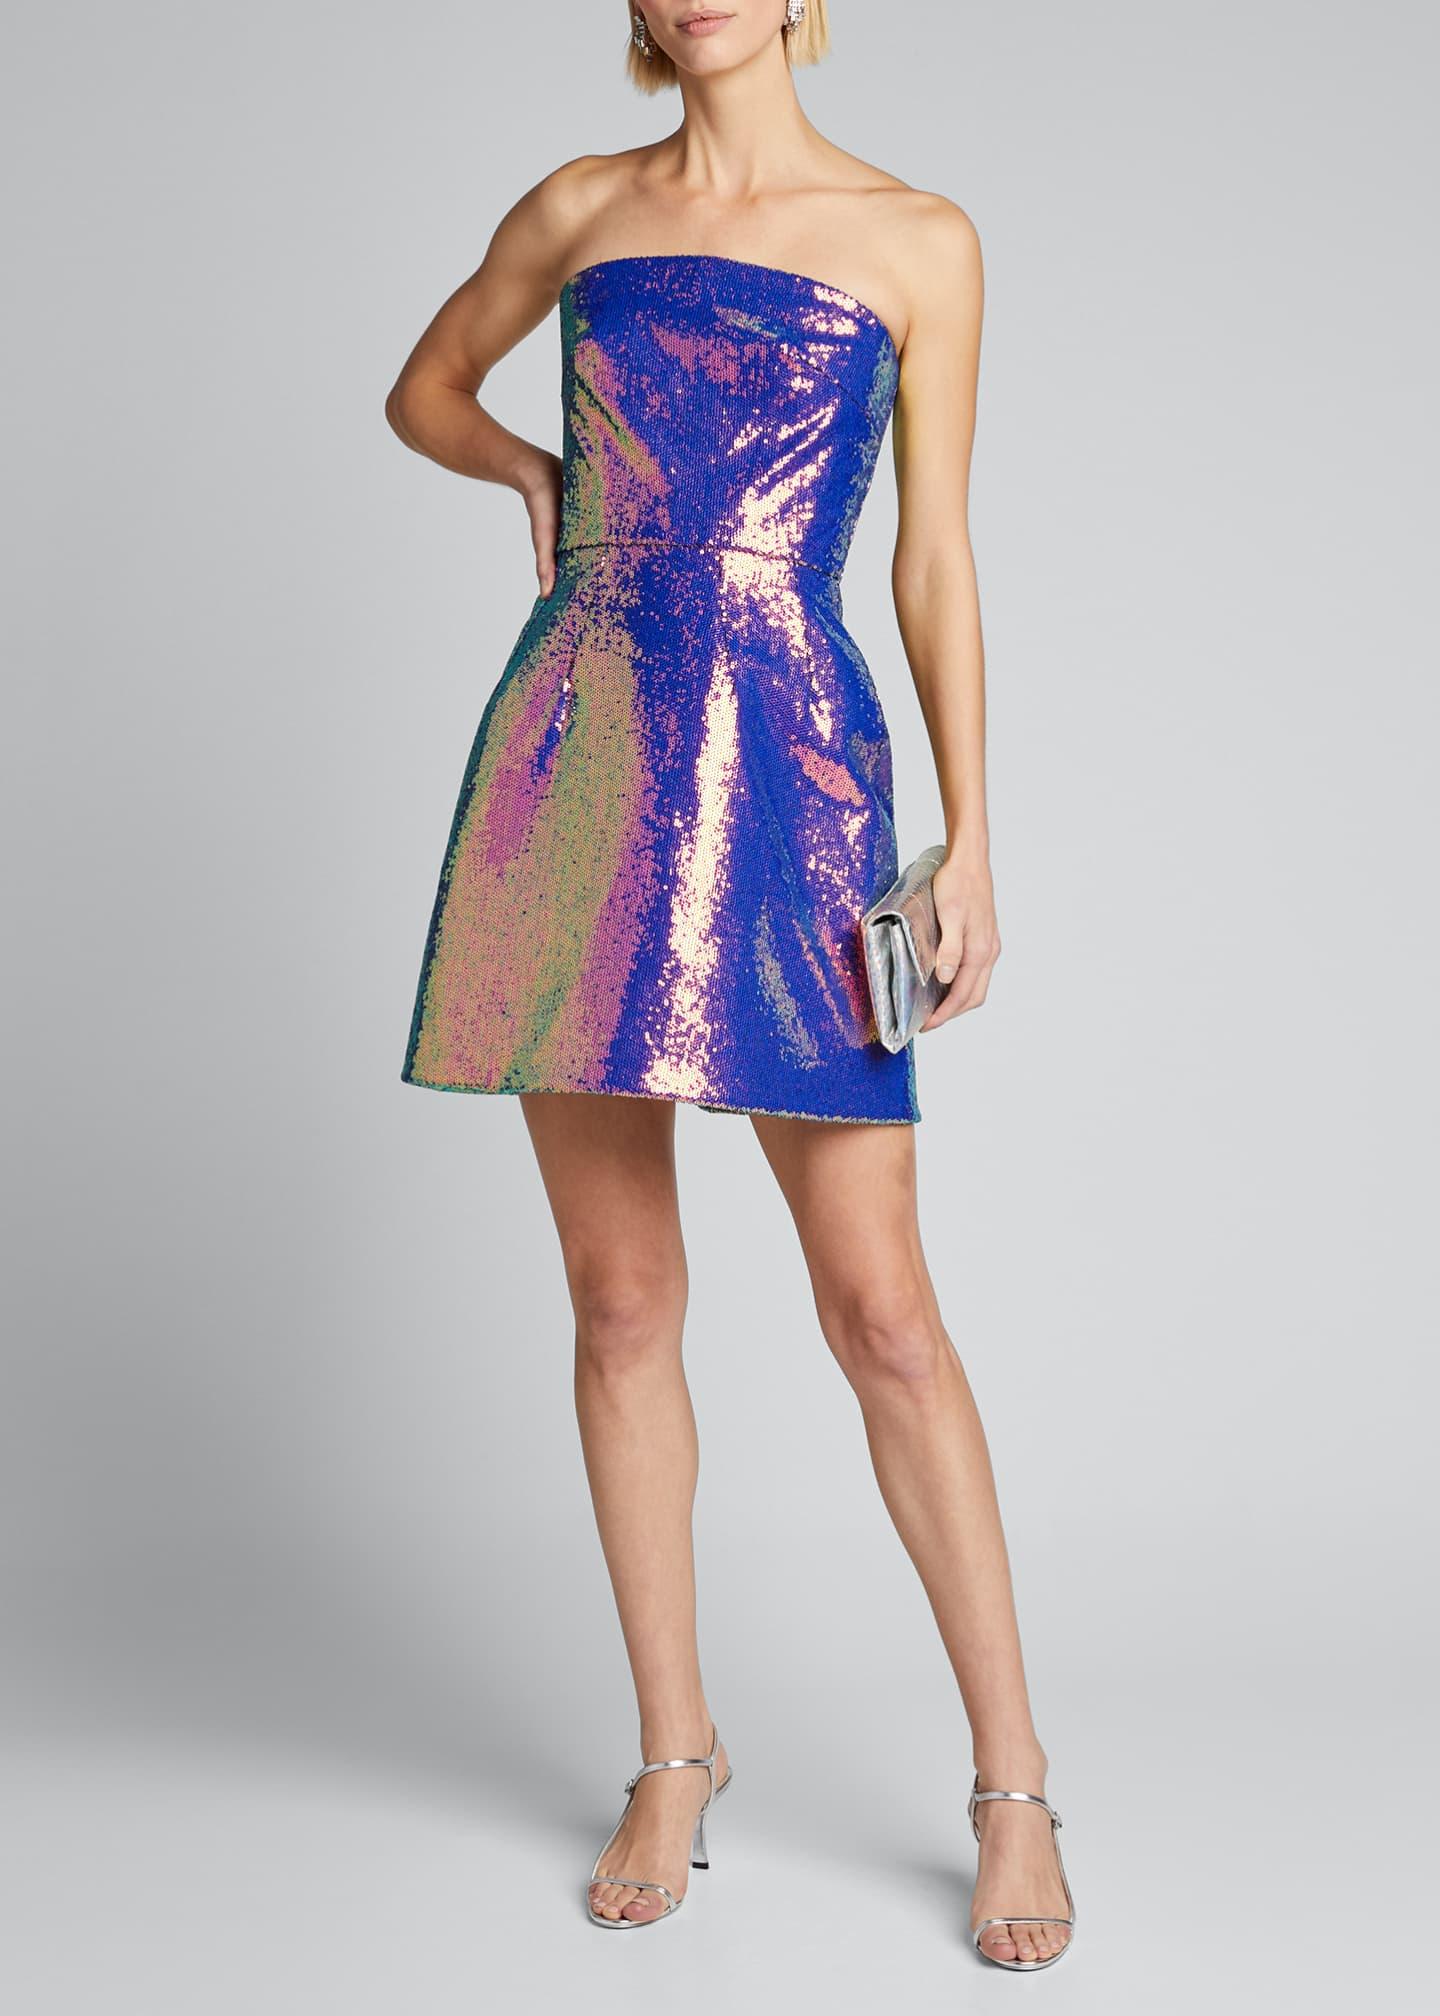 Monique Lhuillier Iridescent Sequined Fit-&-Flare Party Dress